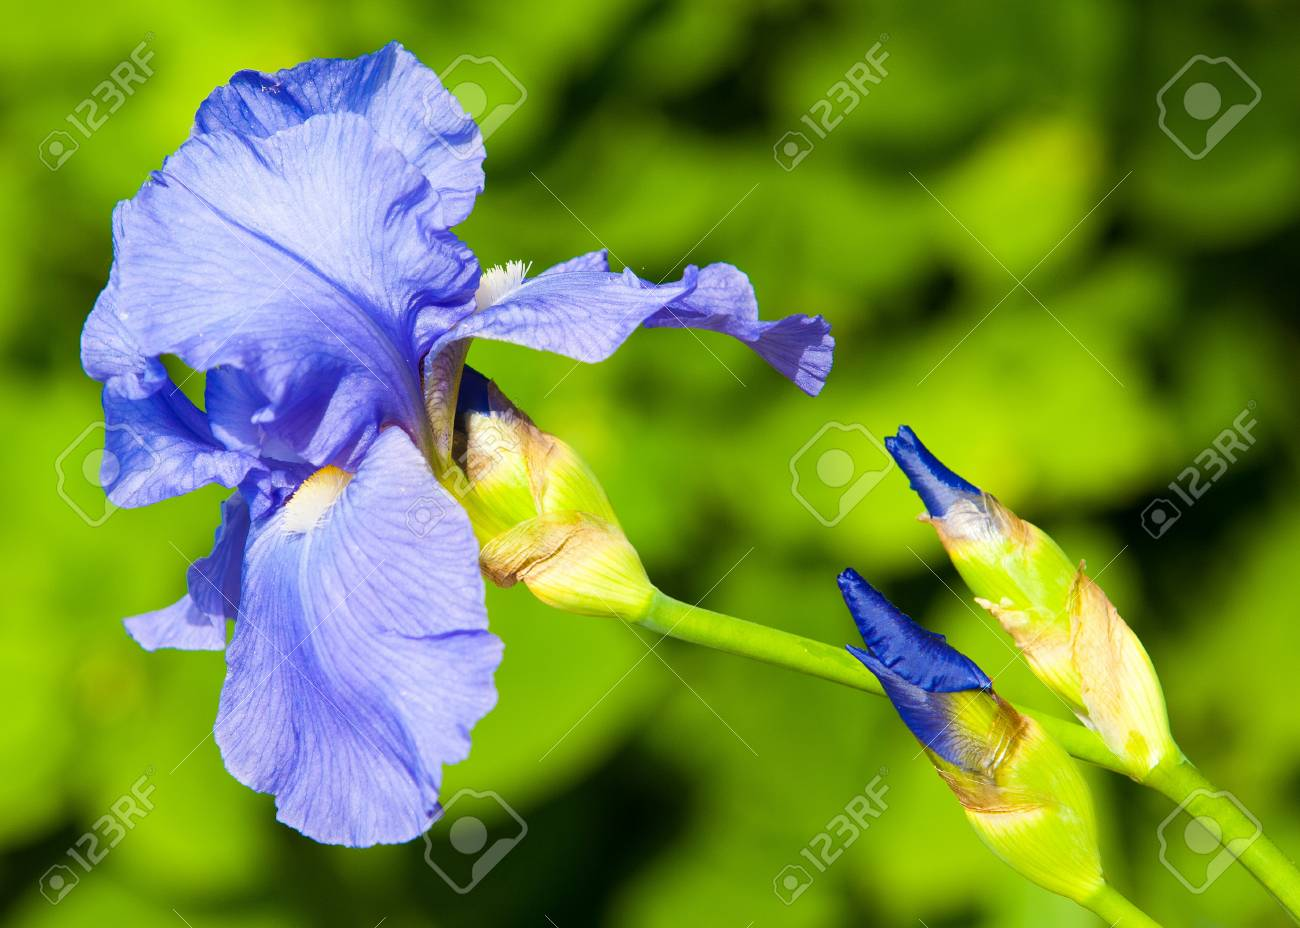 Gladiolus sword lily gladiole glad an old world plant of stock gladiolus sword lily gladiole glad an old world plant of the iris izmirmasajfo